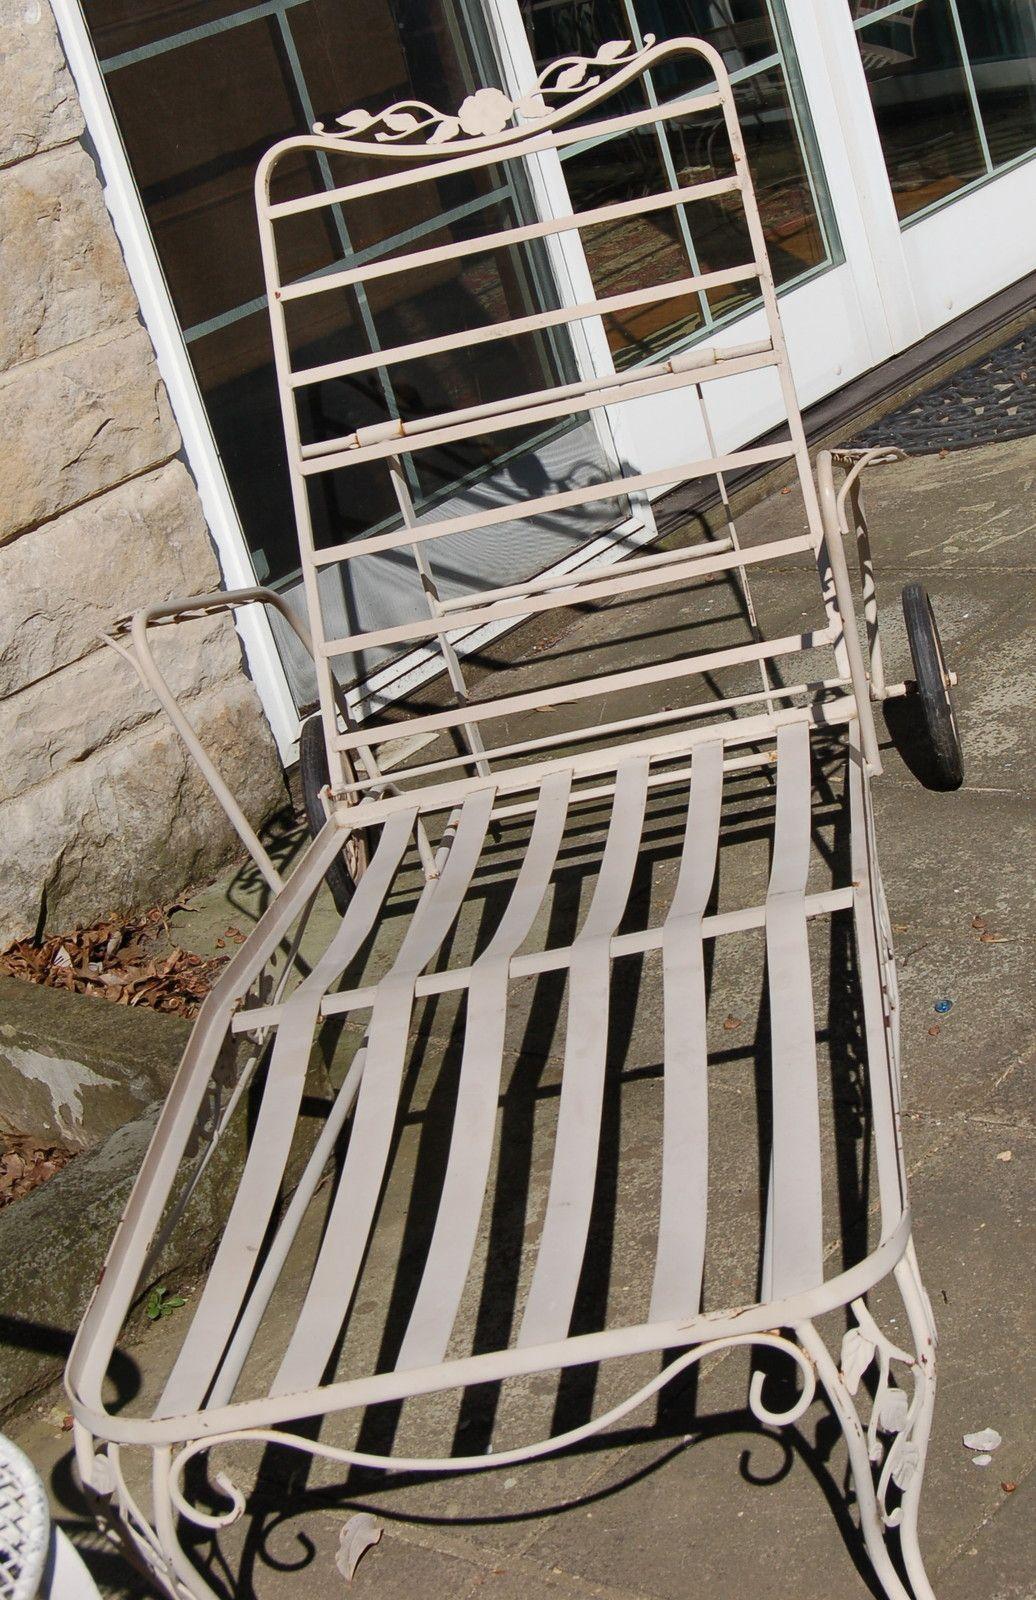 Lyon Shaw Windflower Lattice Patio Furniture Collection Vintage